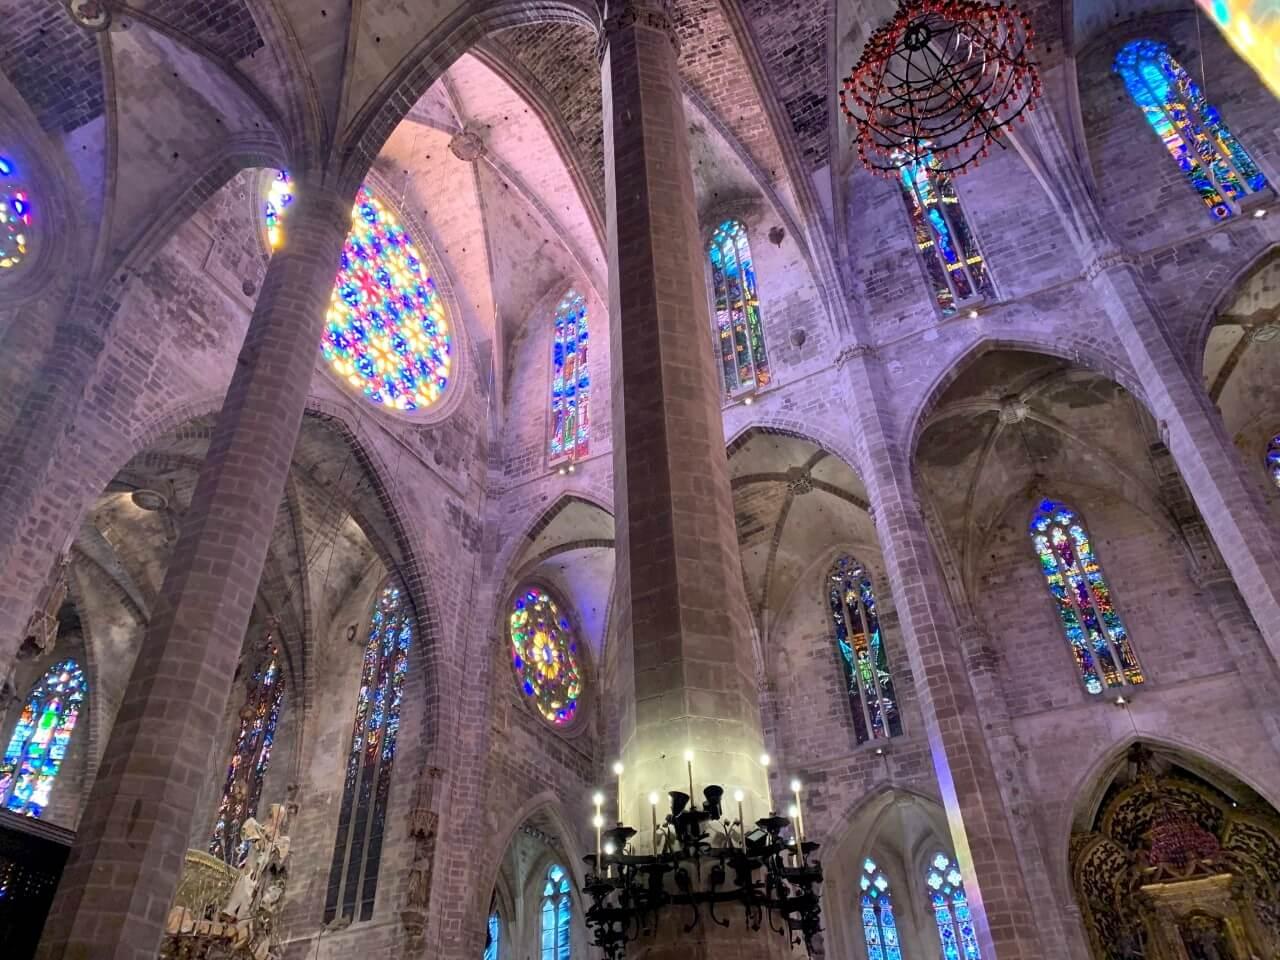 Interior Catedral de Palma